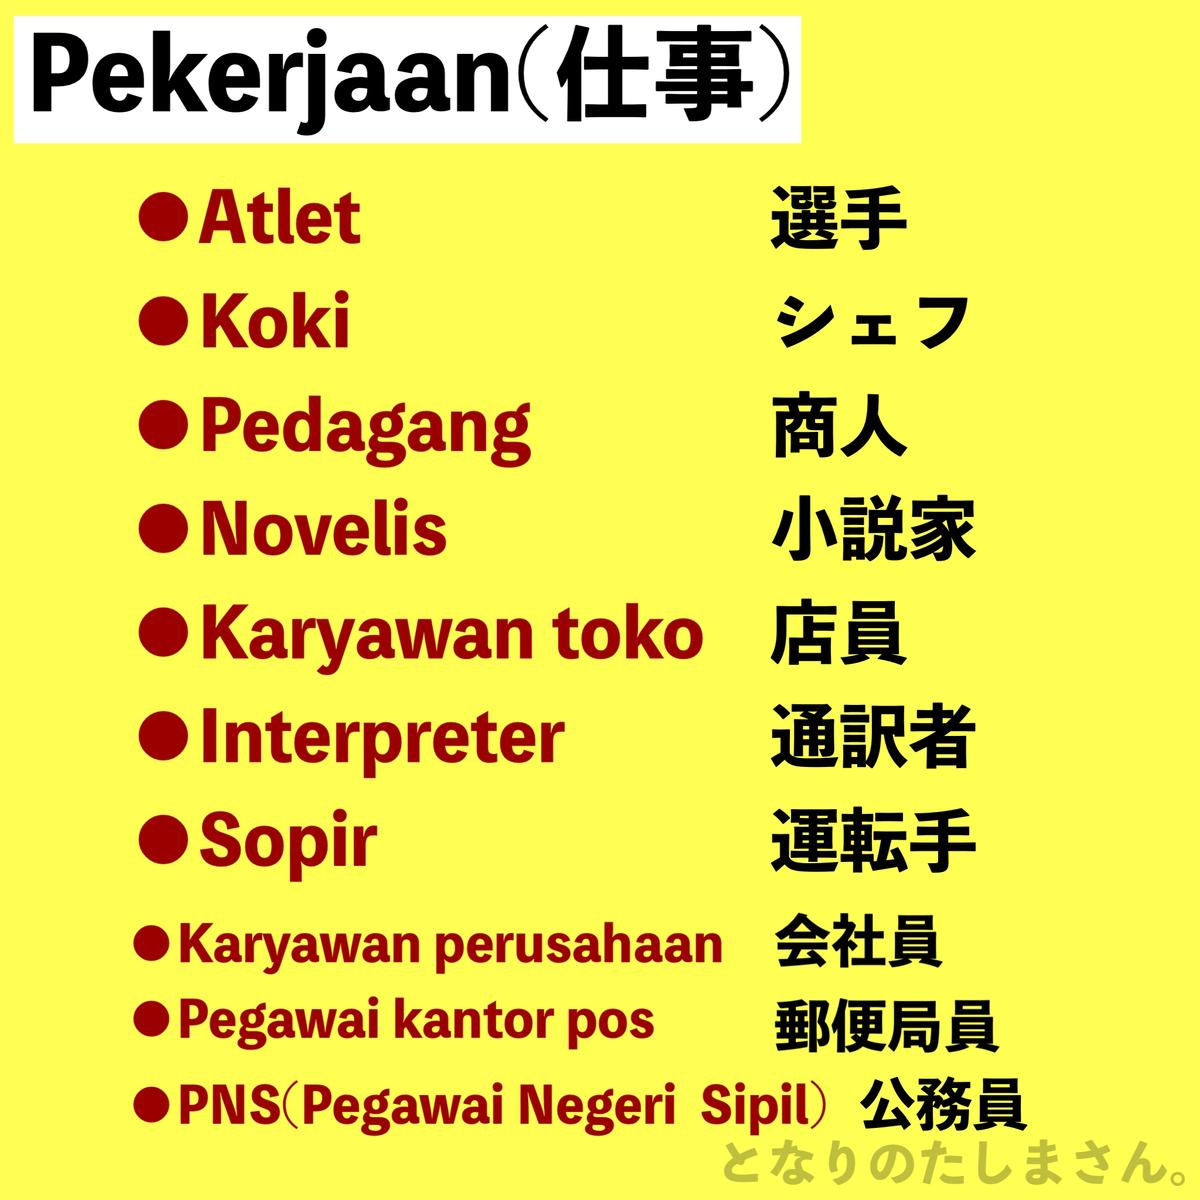 f:id:yutonsmaile:20210917123626j:plain